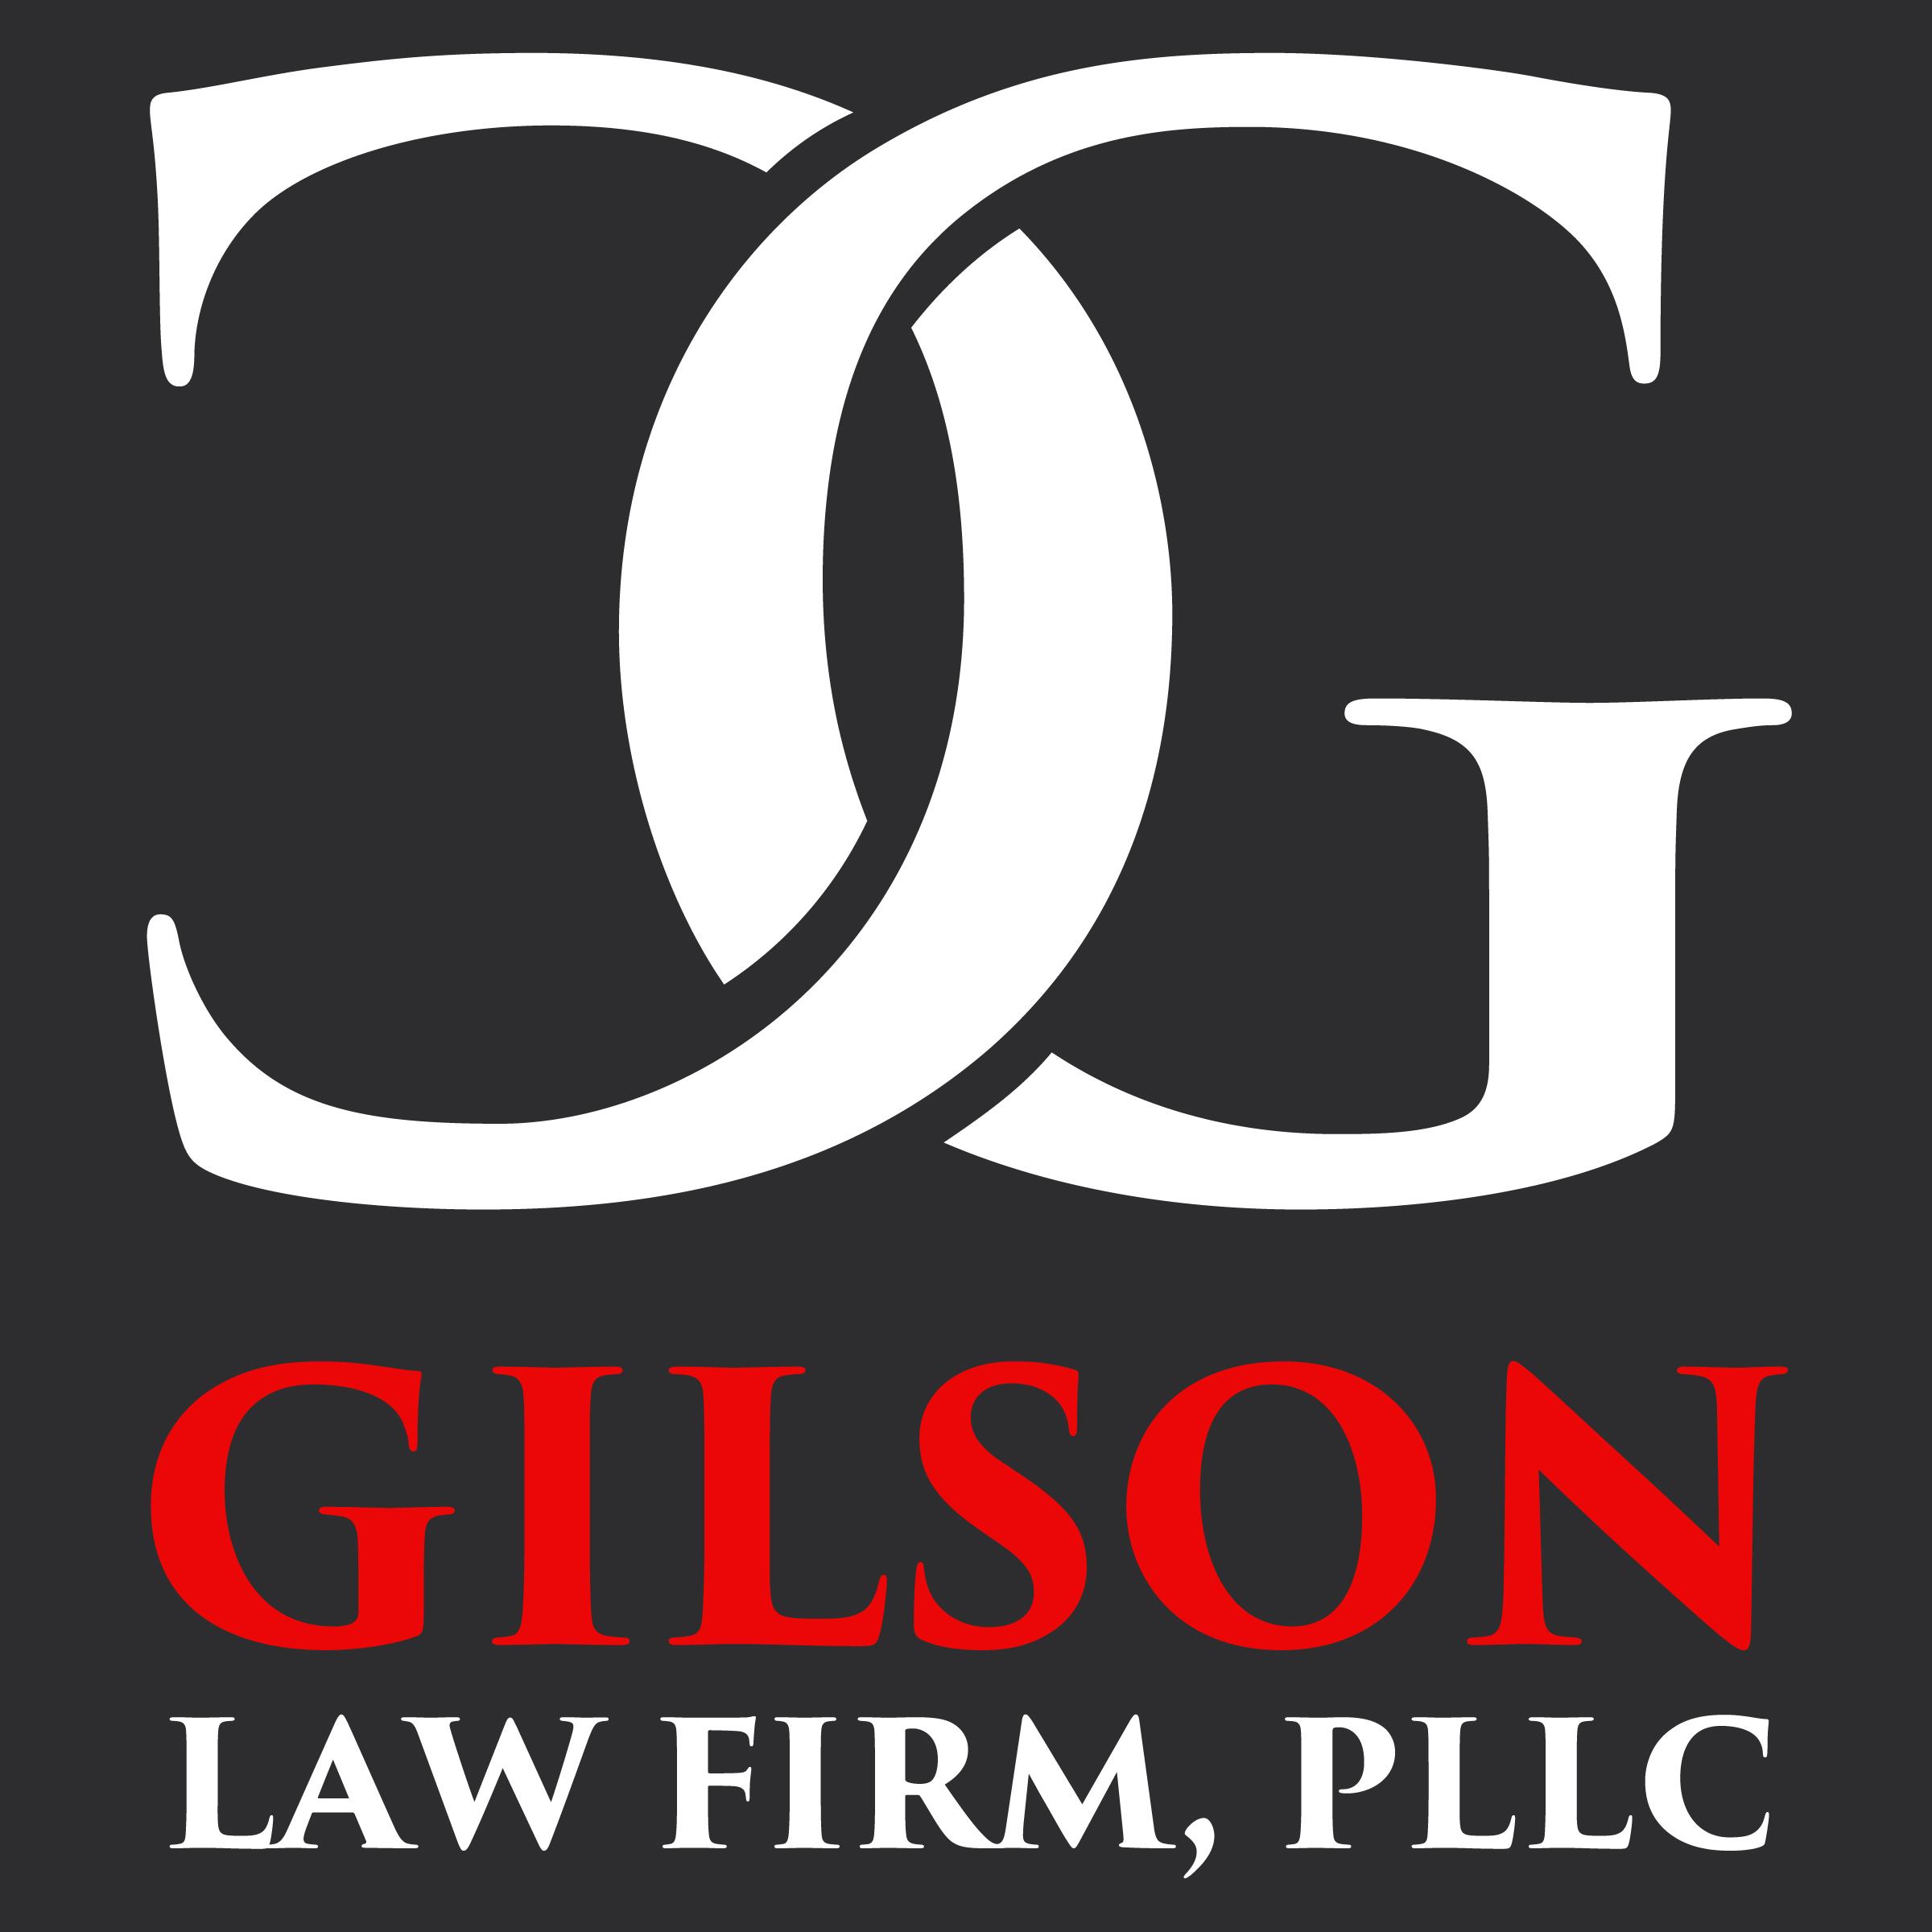 Gilson Law Firm PLLC